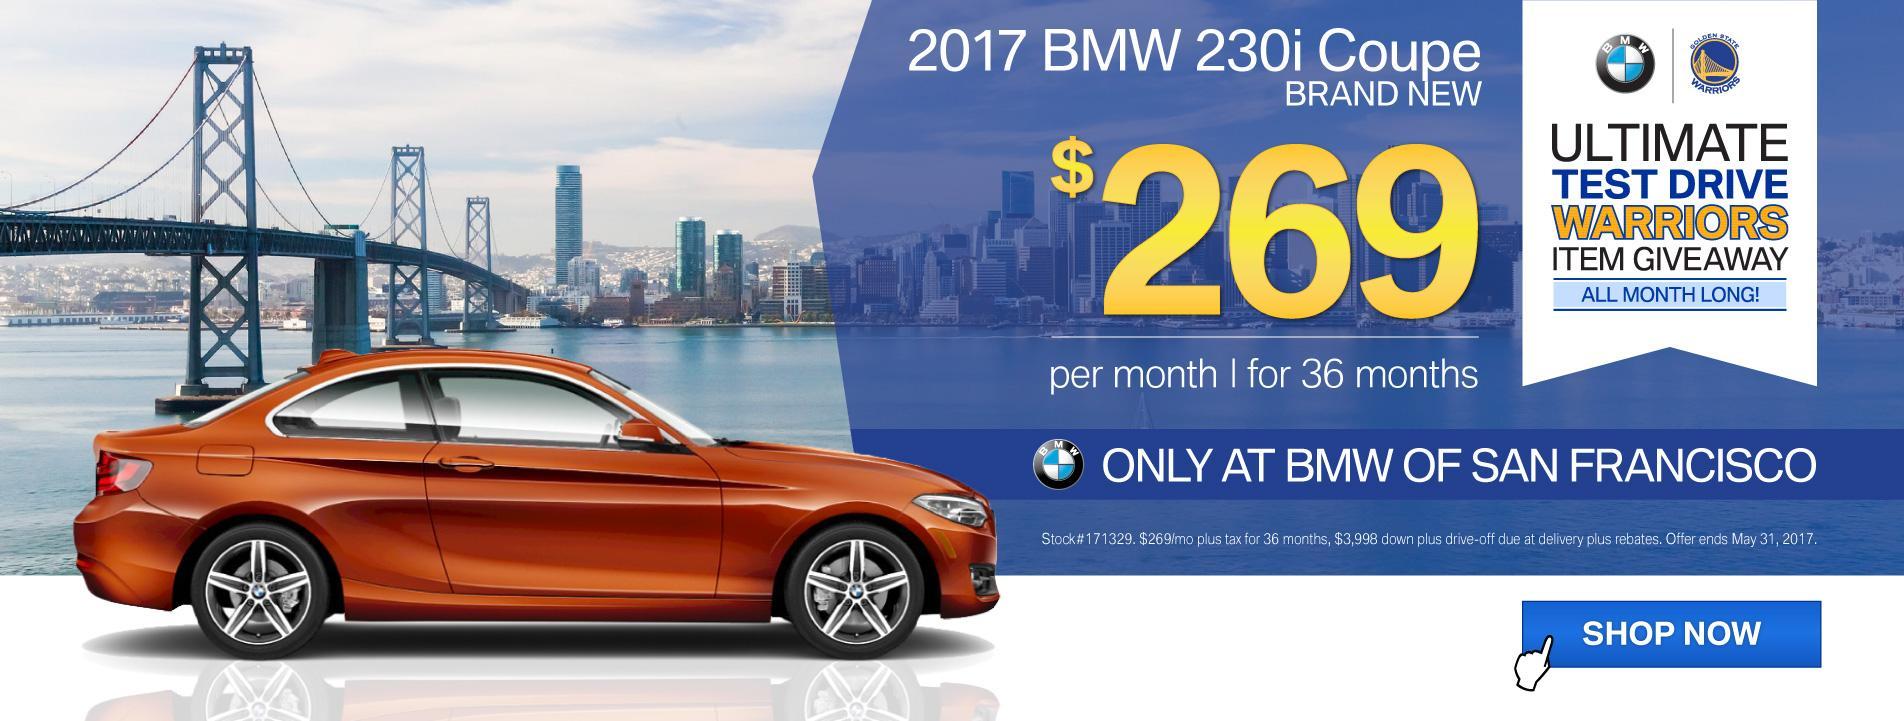 BMWSF 2 Series Offer